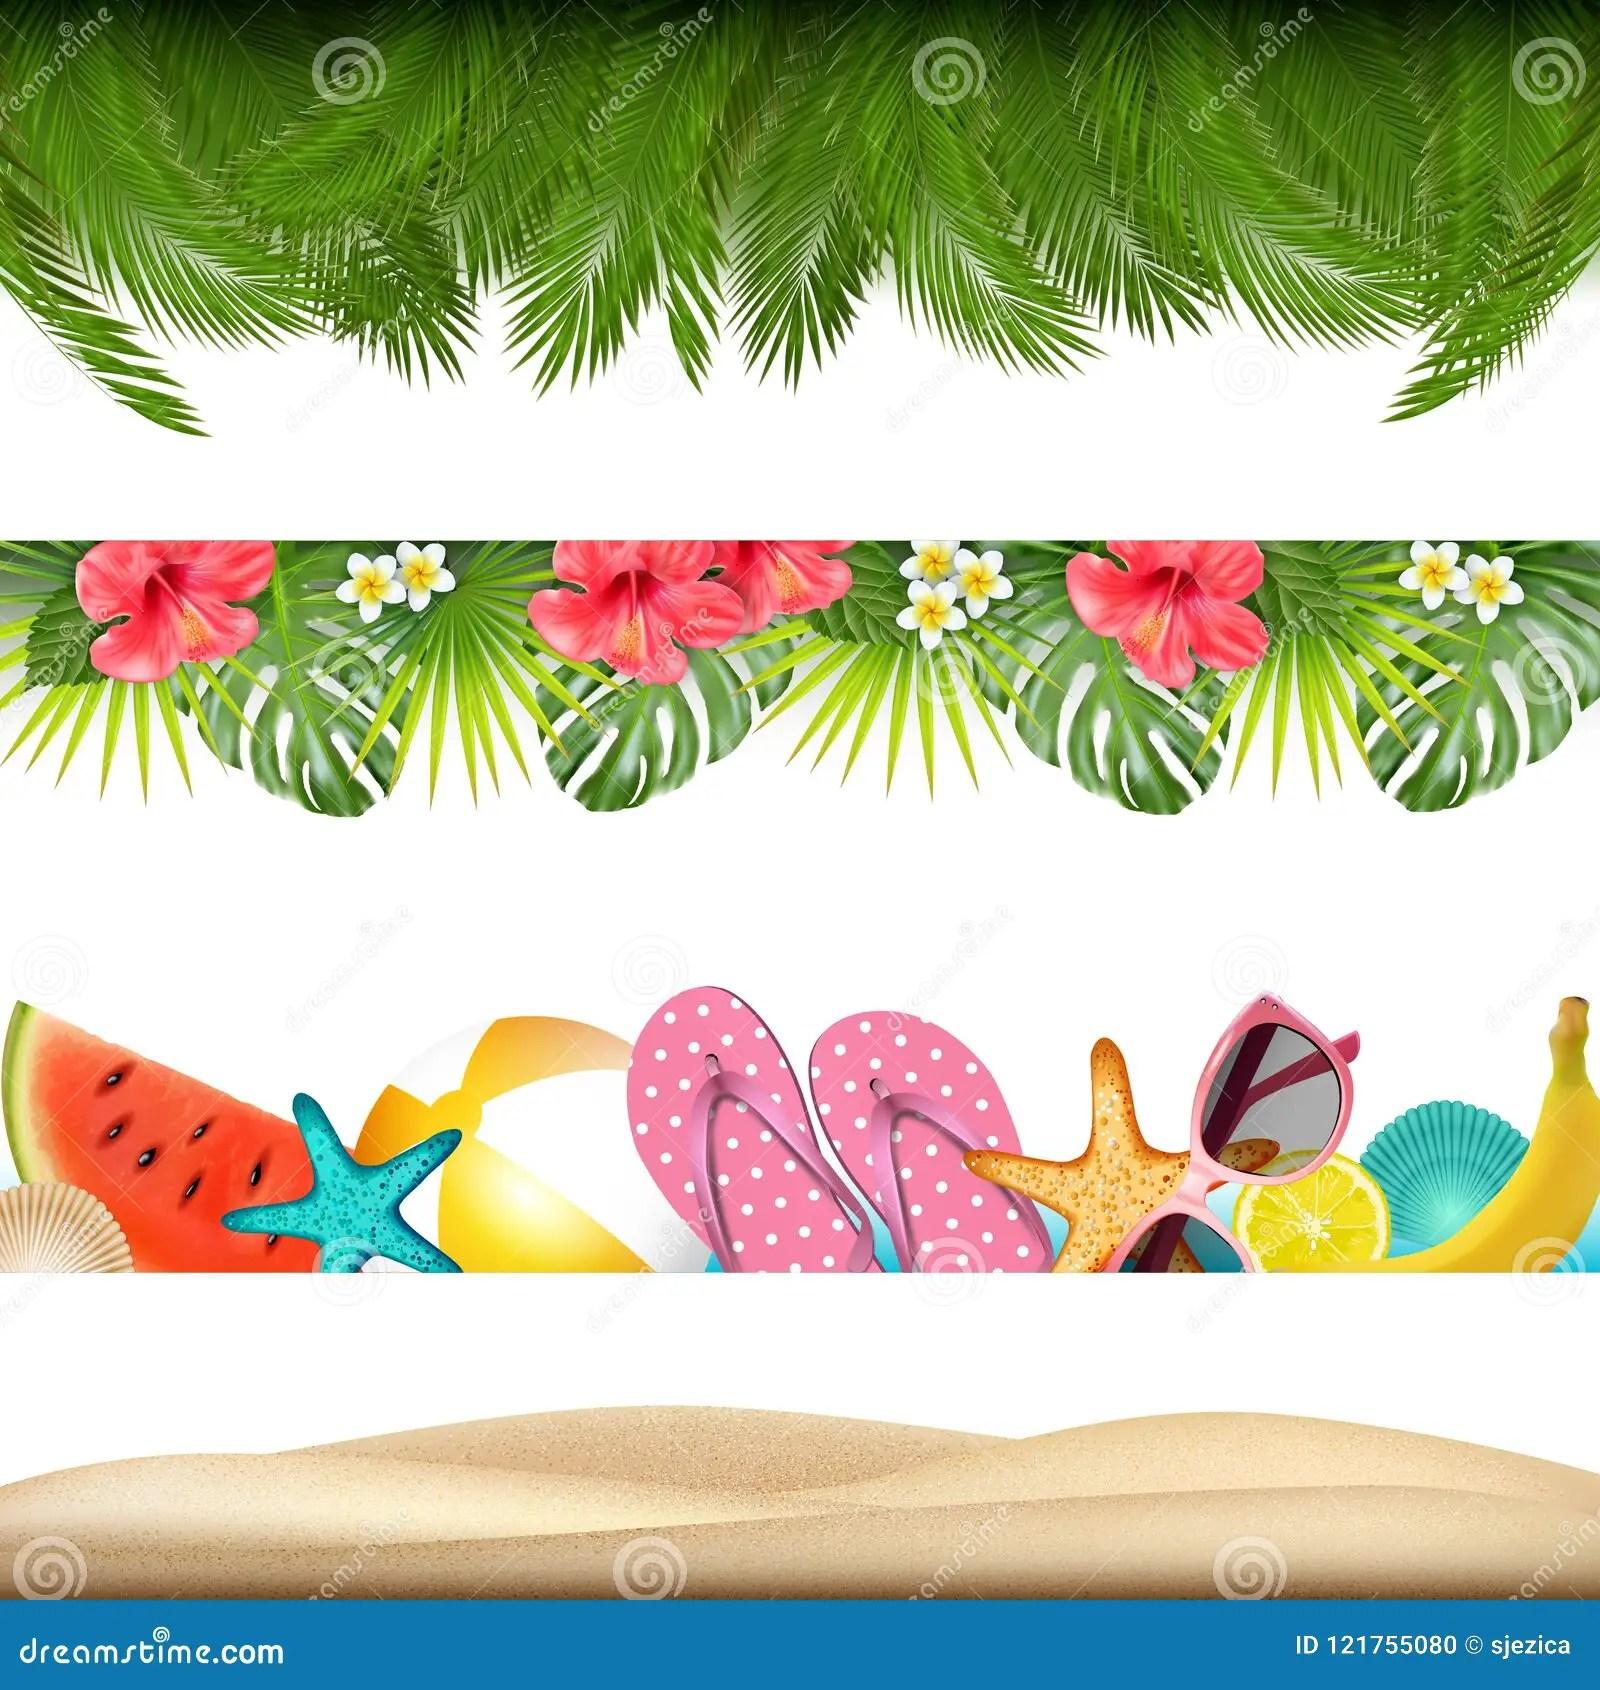 summer borders stock illustrations